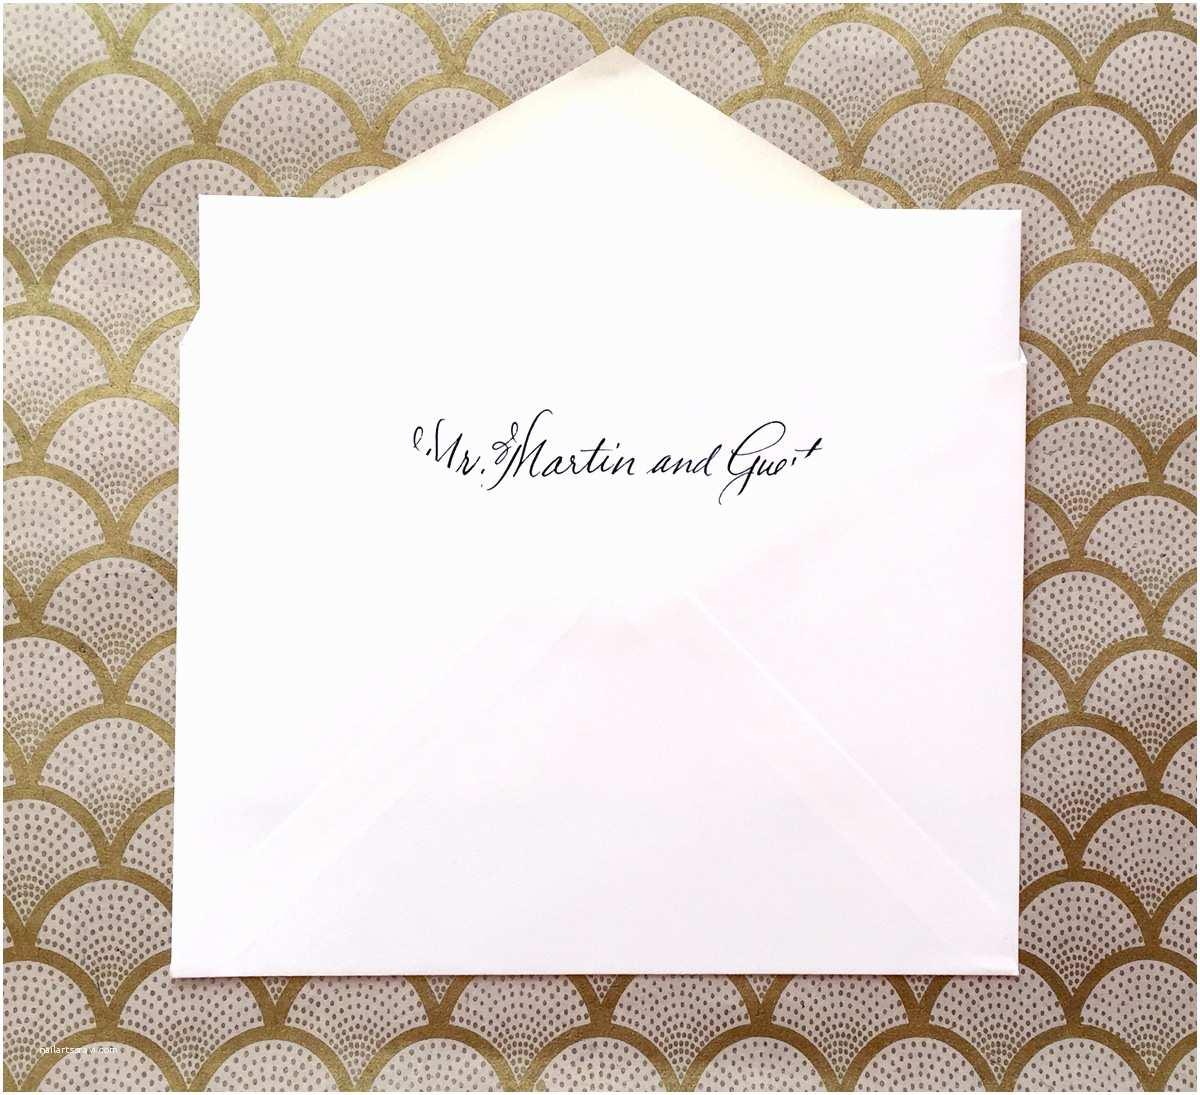 Envelope Etiquette for Wedding Invitations Nico and Lala Wedding Invitation Etiquette Inner and